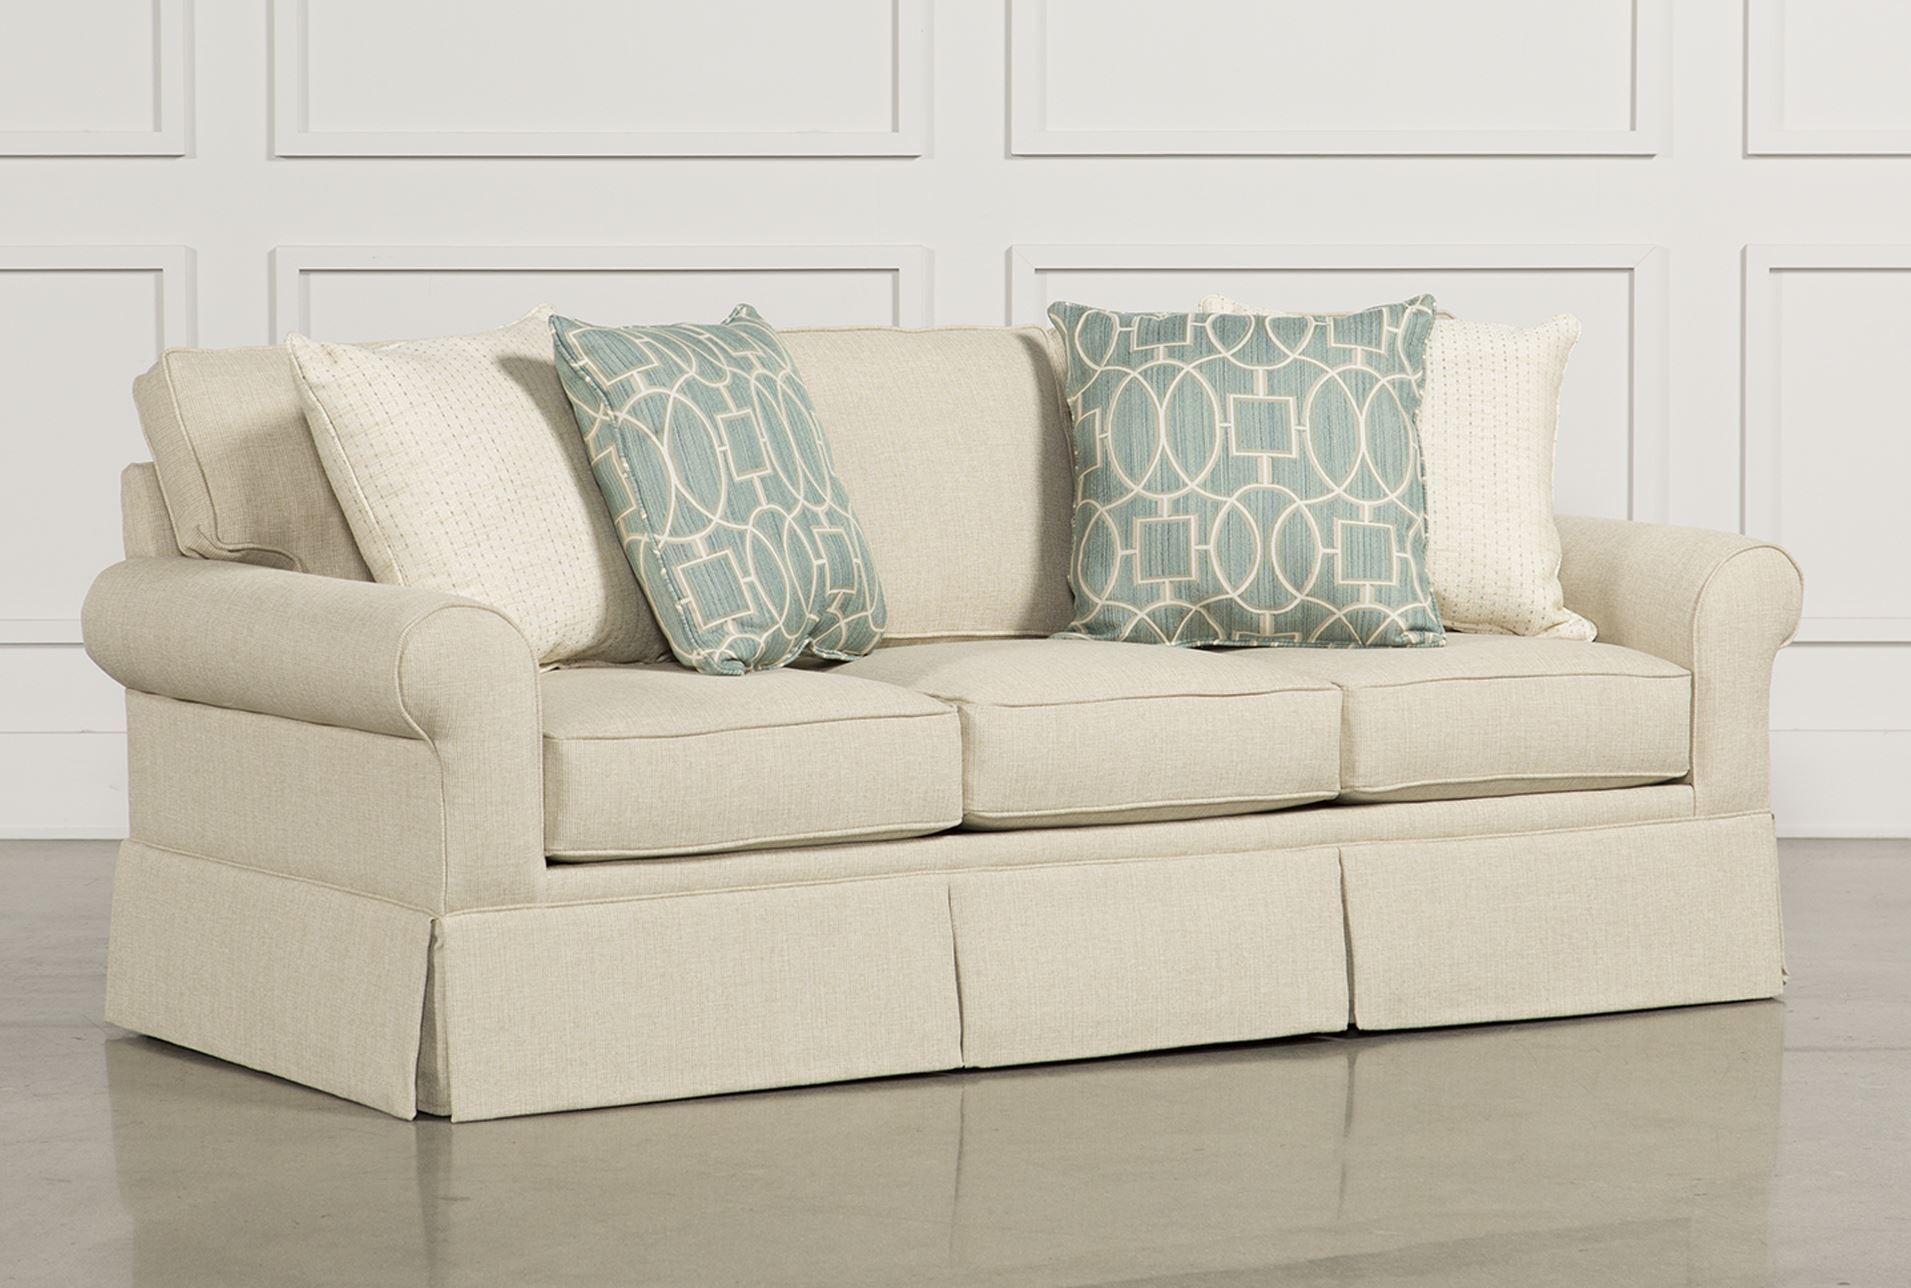 contemporary fabric sofas durable sofa set 20 photos white ideas